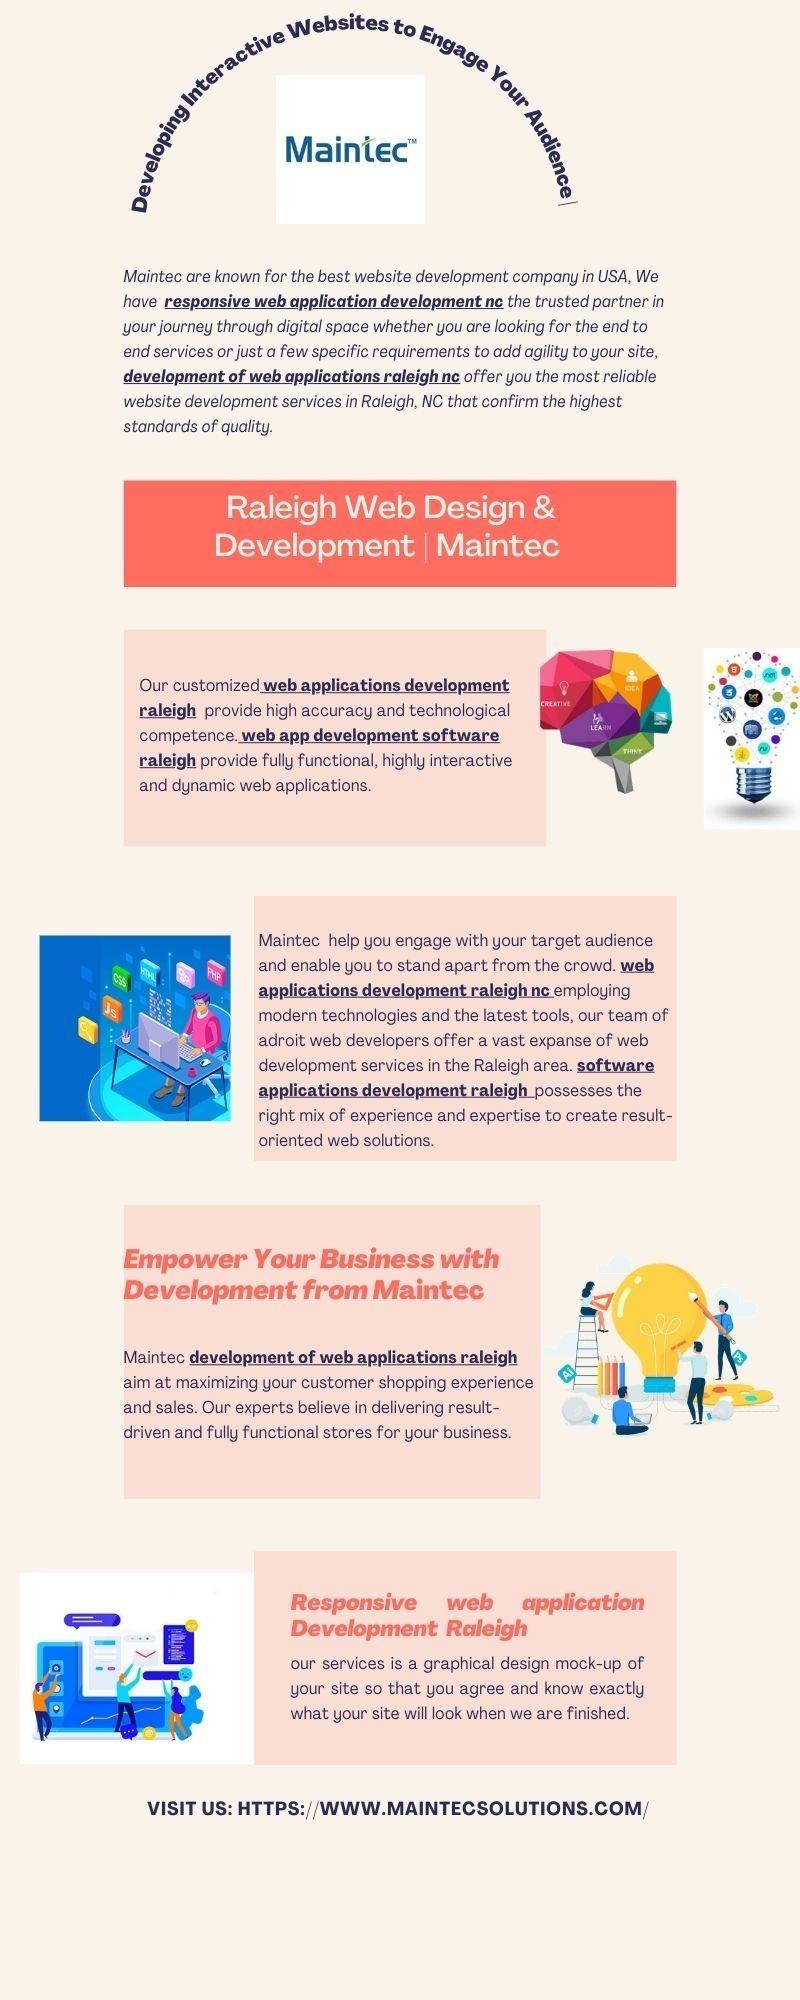 Best Digital Marketing Services in 2021 For Online Marketing | Maintec